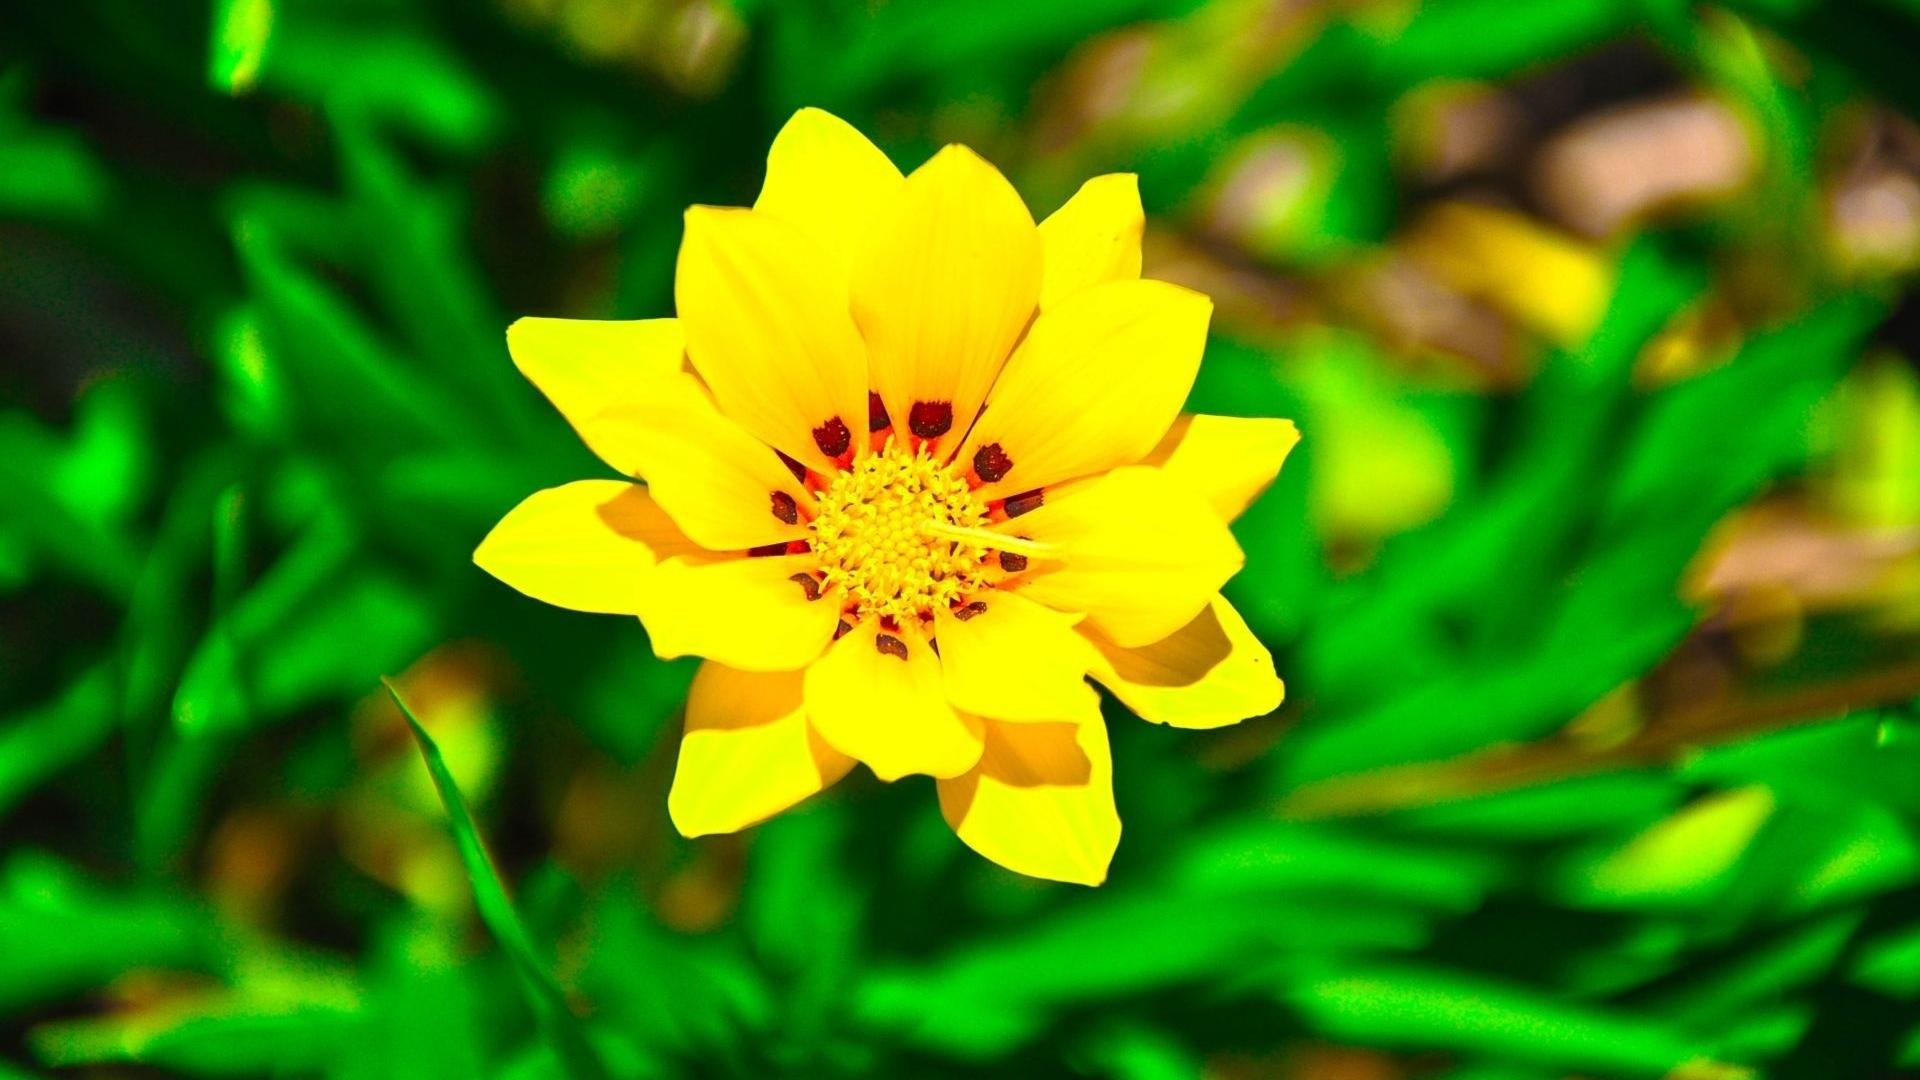 Download wallpaper 1920x1080 flower yellow green grass full hd flower yellow green mightylinksfo